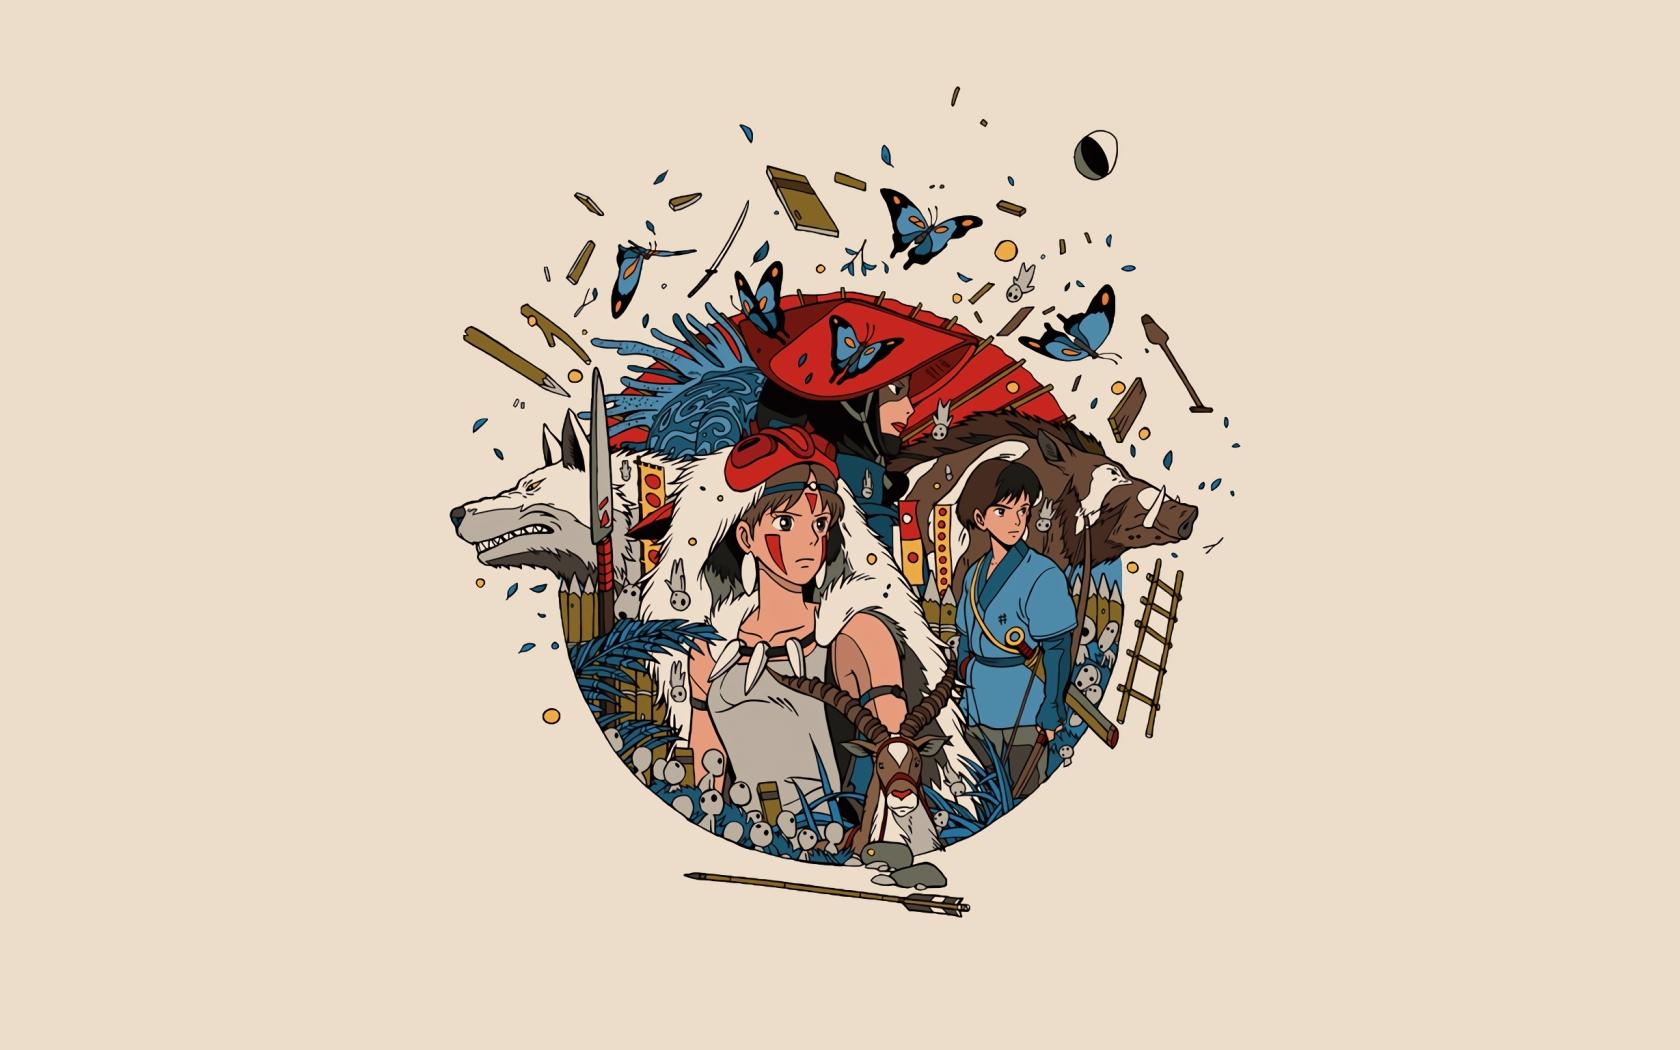 Princess mononoke full hd 2k wallpaper - Mononoke anime wallpaper ...